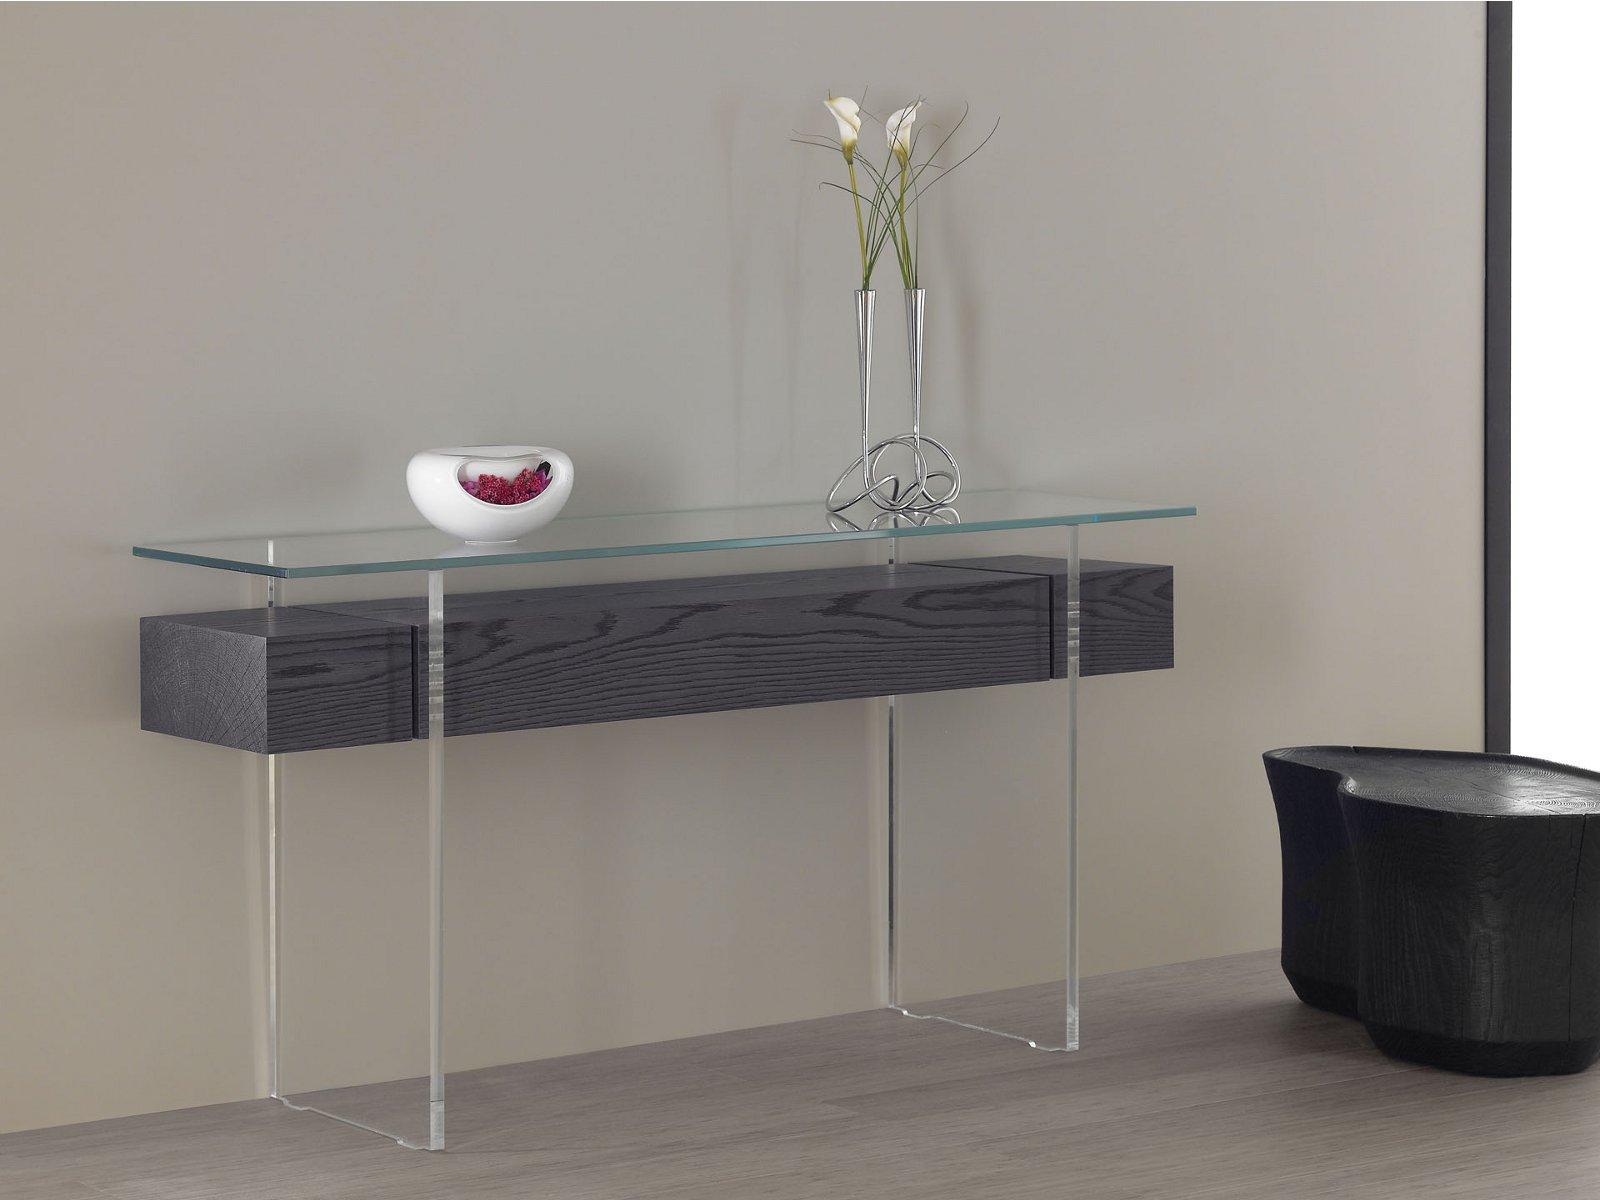 Simple Modern Wood Long Glass Console Tables Beautiful Decorative Flowers  Decorative White Vase Unique Balck Wood